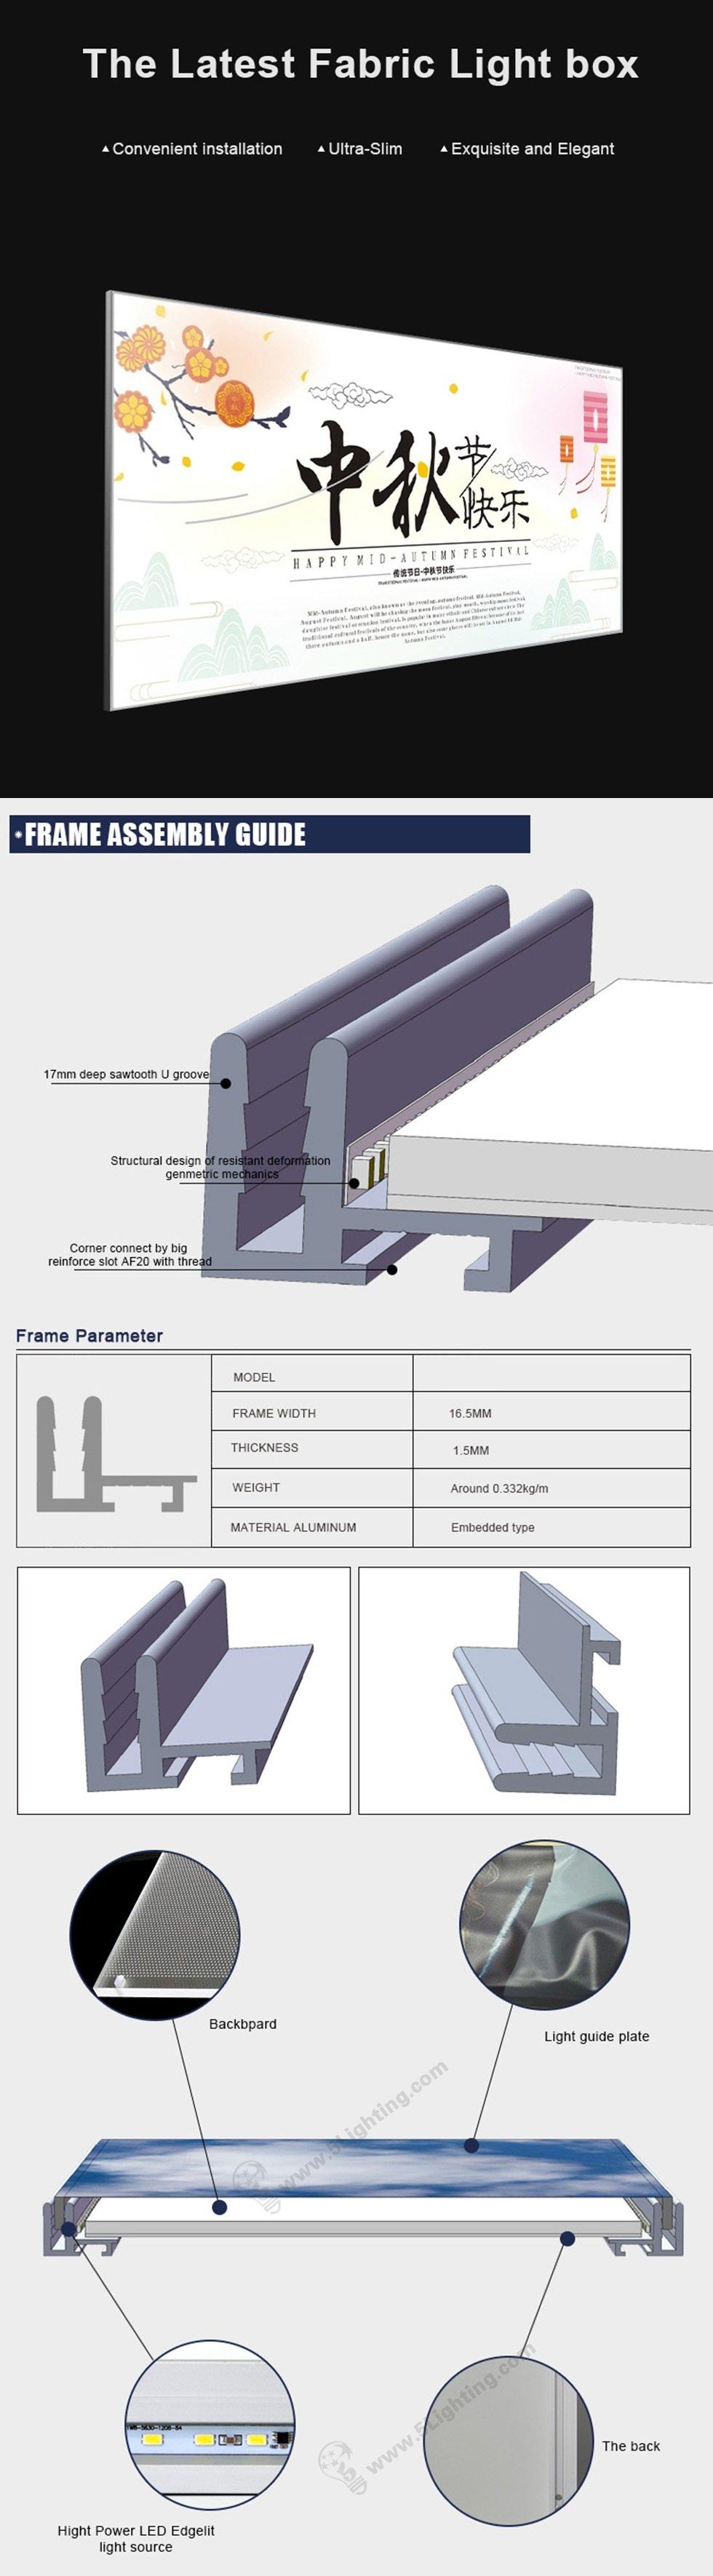 ultra slim fabric light box profiles